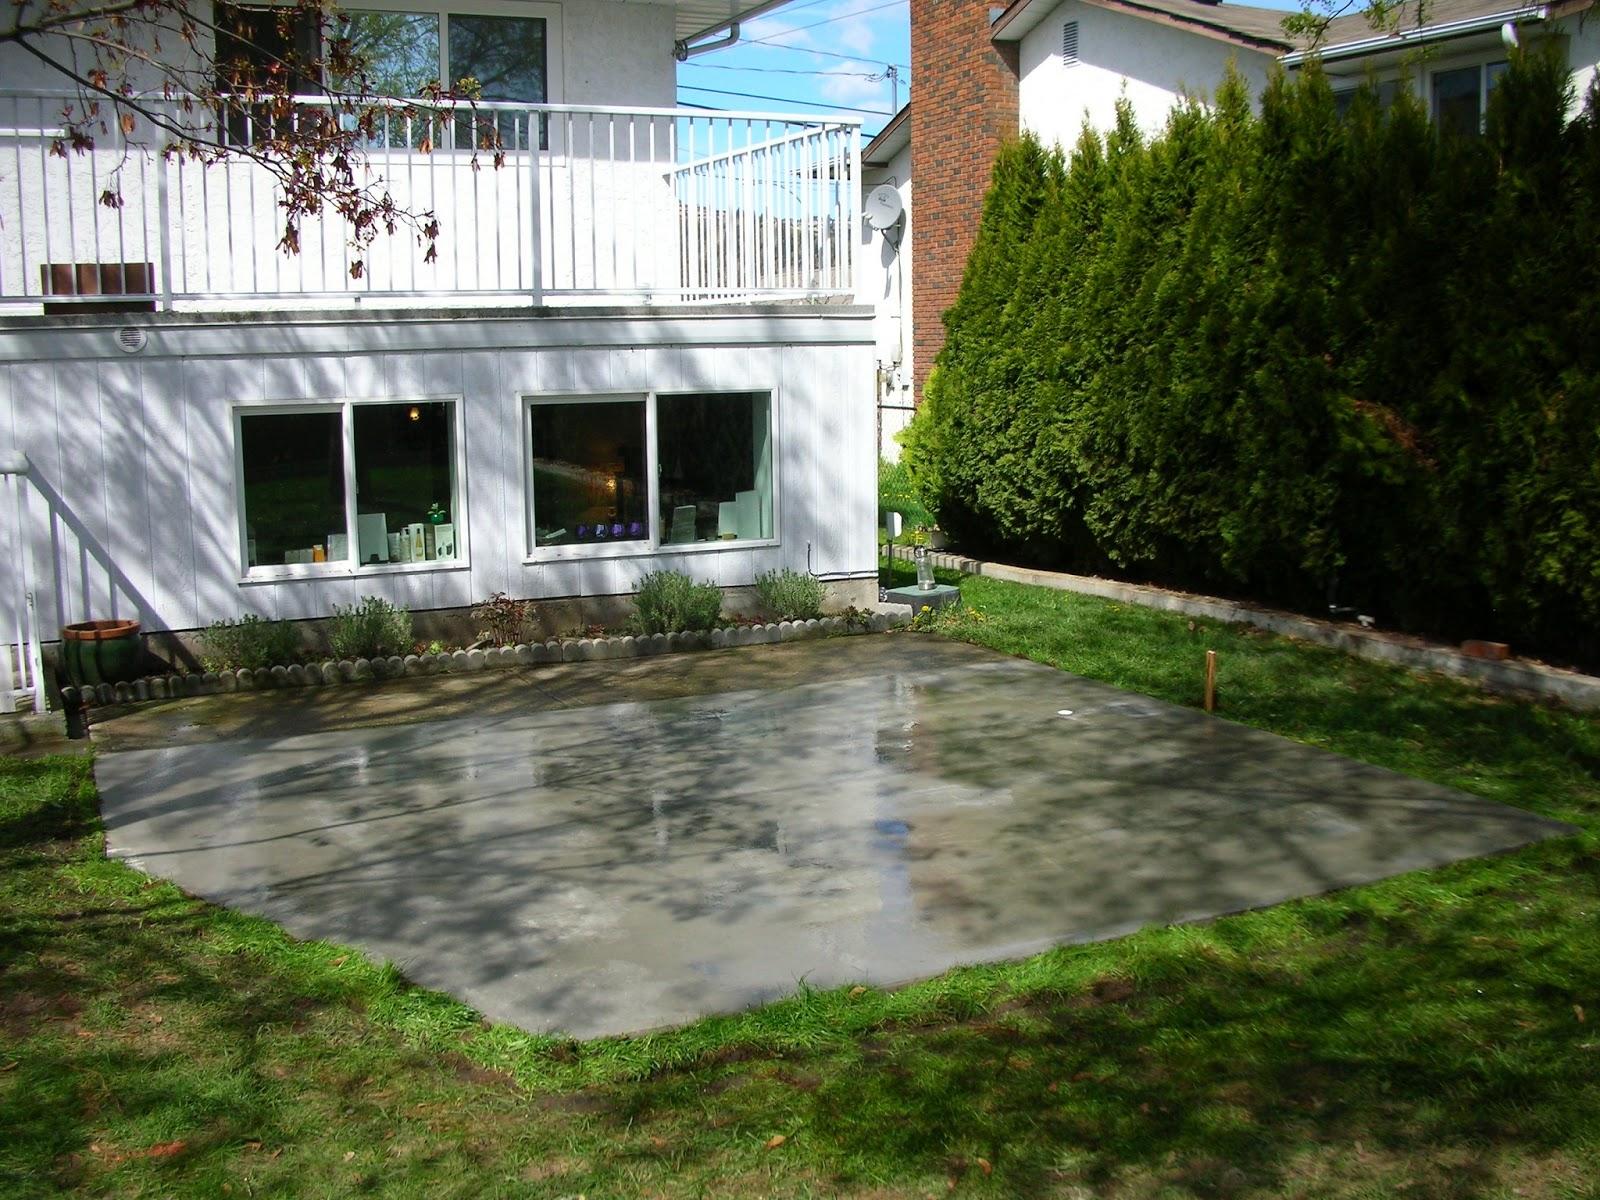 MODE CONCRETE: Concrete Patios, Concrete Slabs, Driveways ... on Concrete Slab Backyard Ideas id=37516